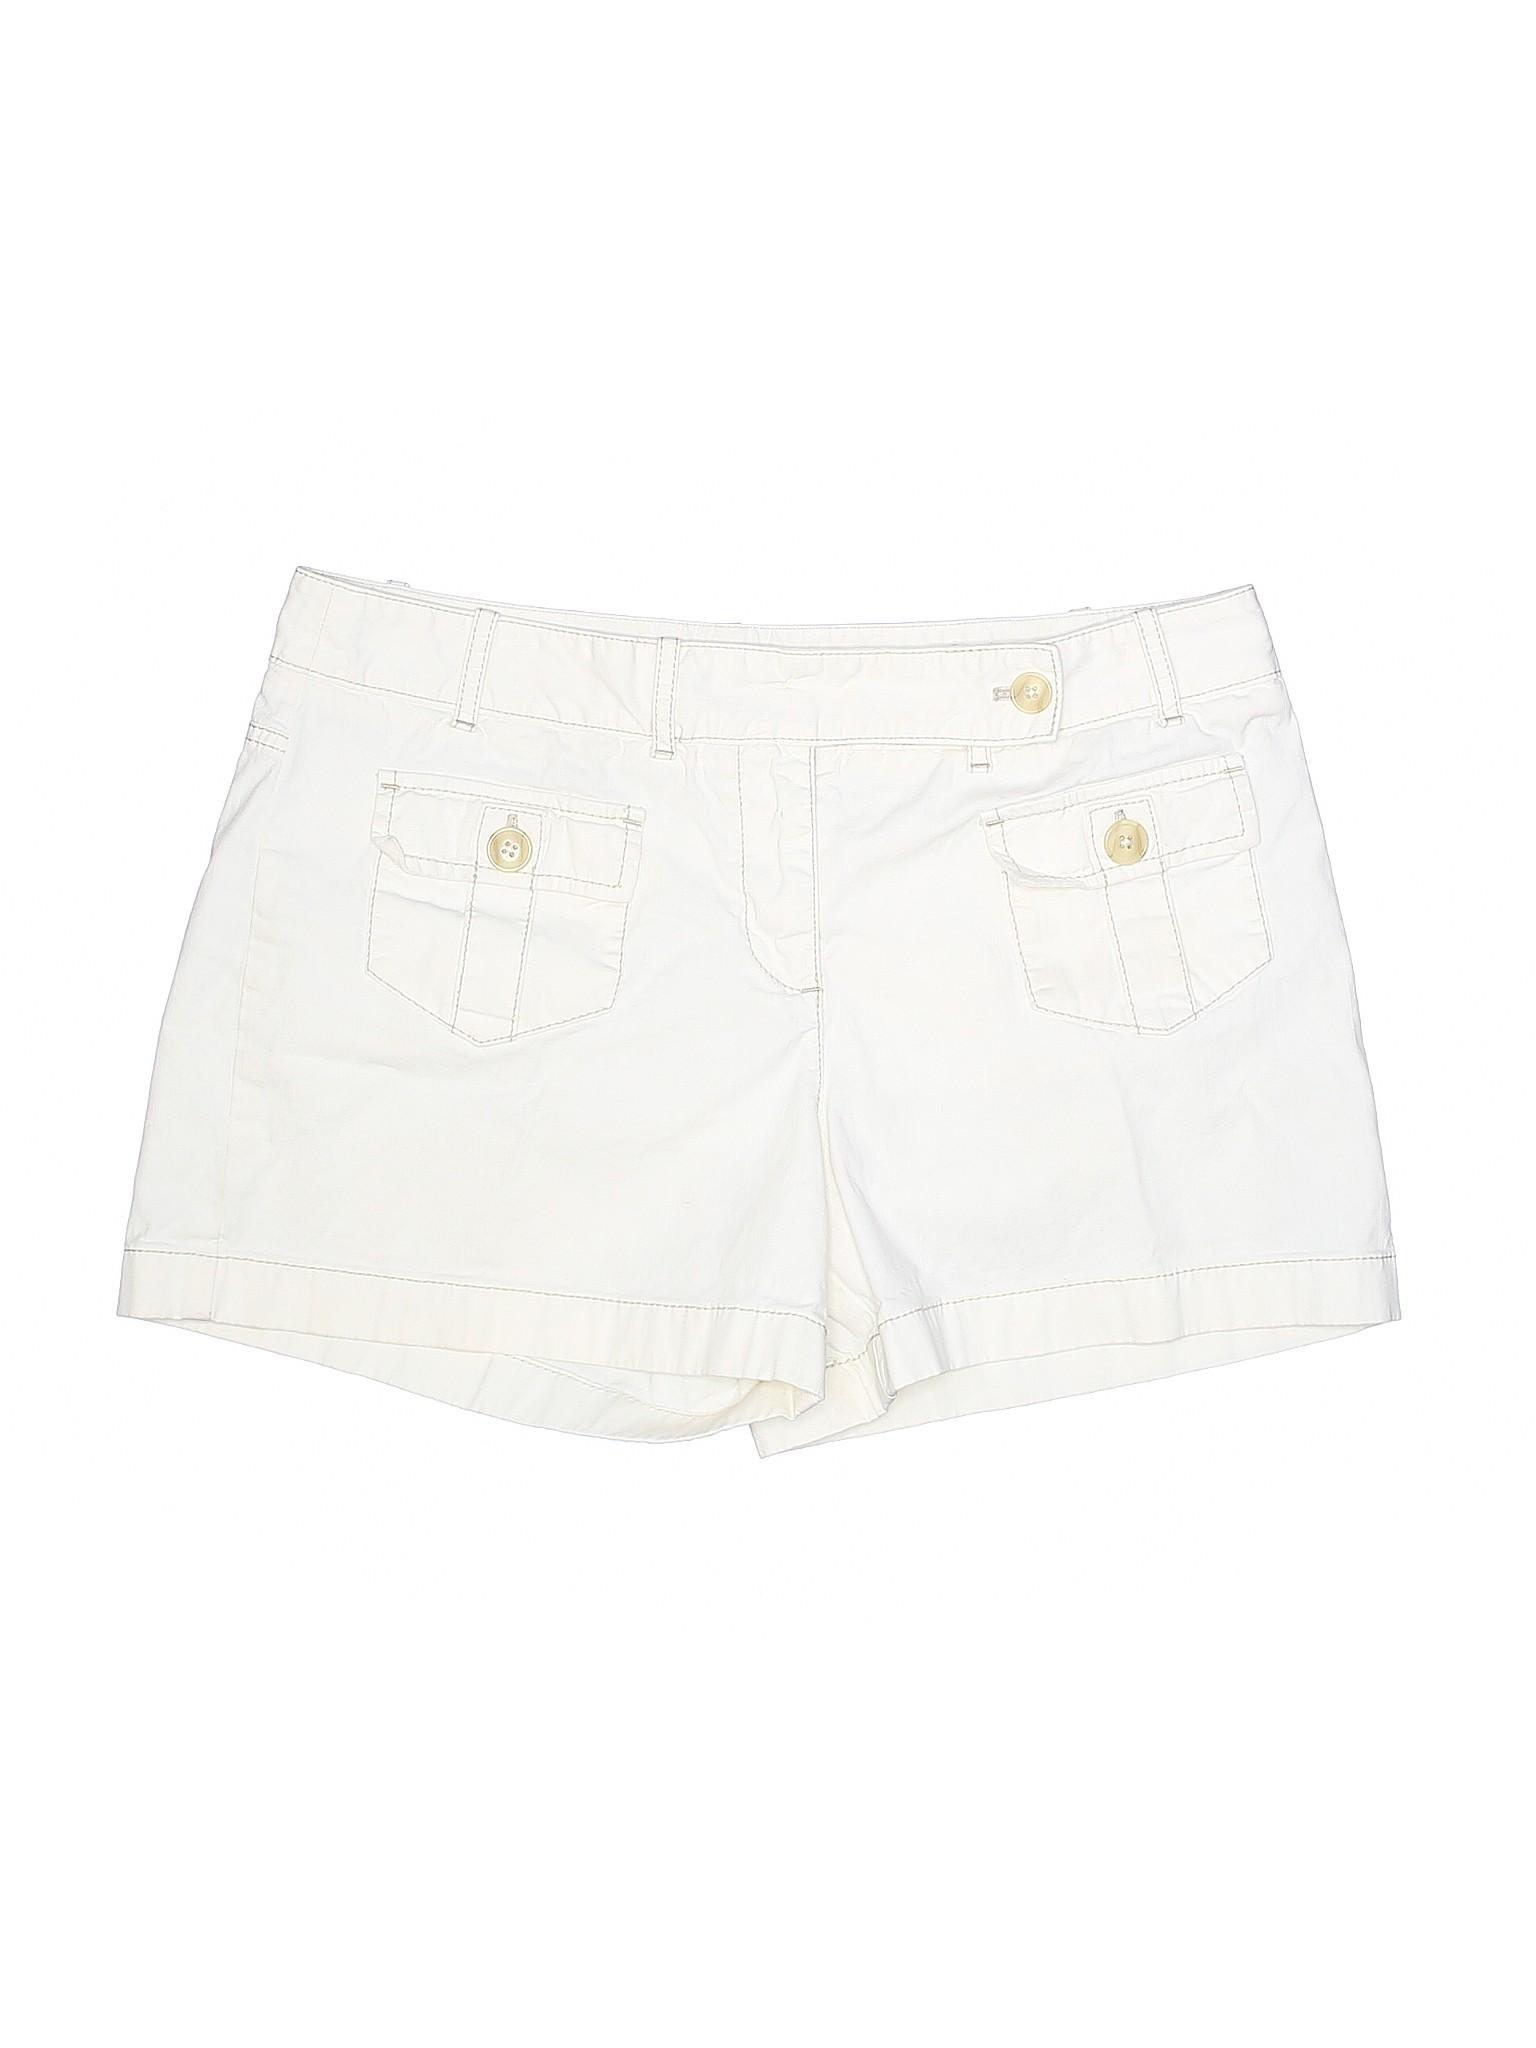 Boutique Khaki Taylor Ann Shorts LOFT qf8q0rxw